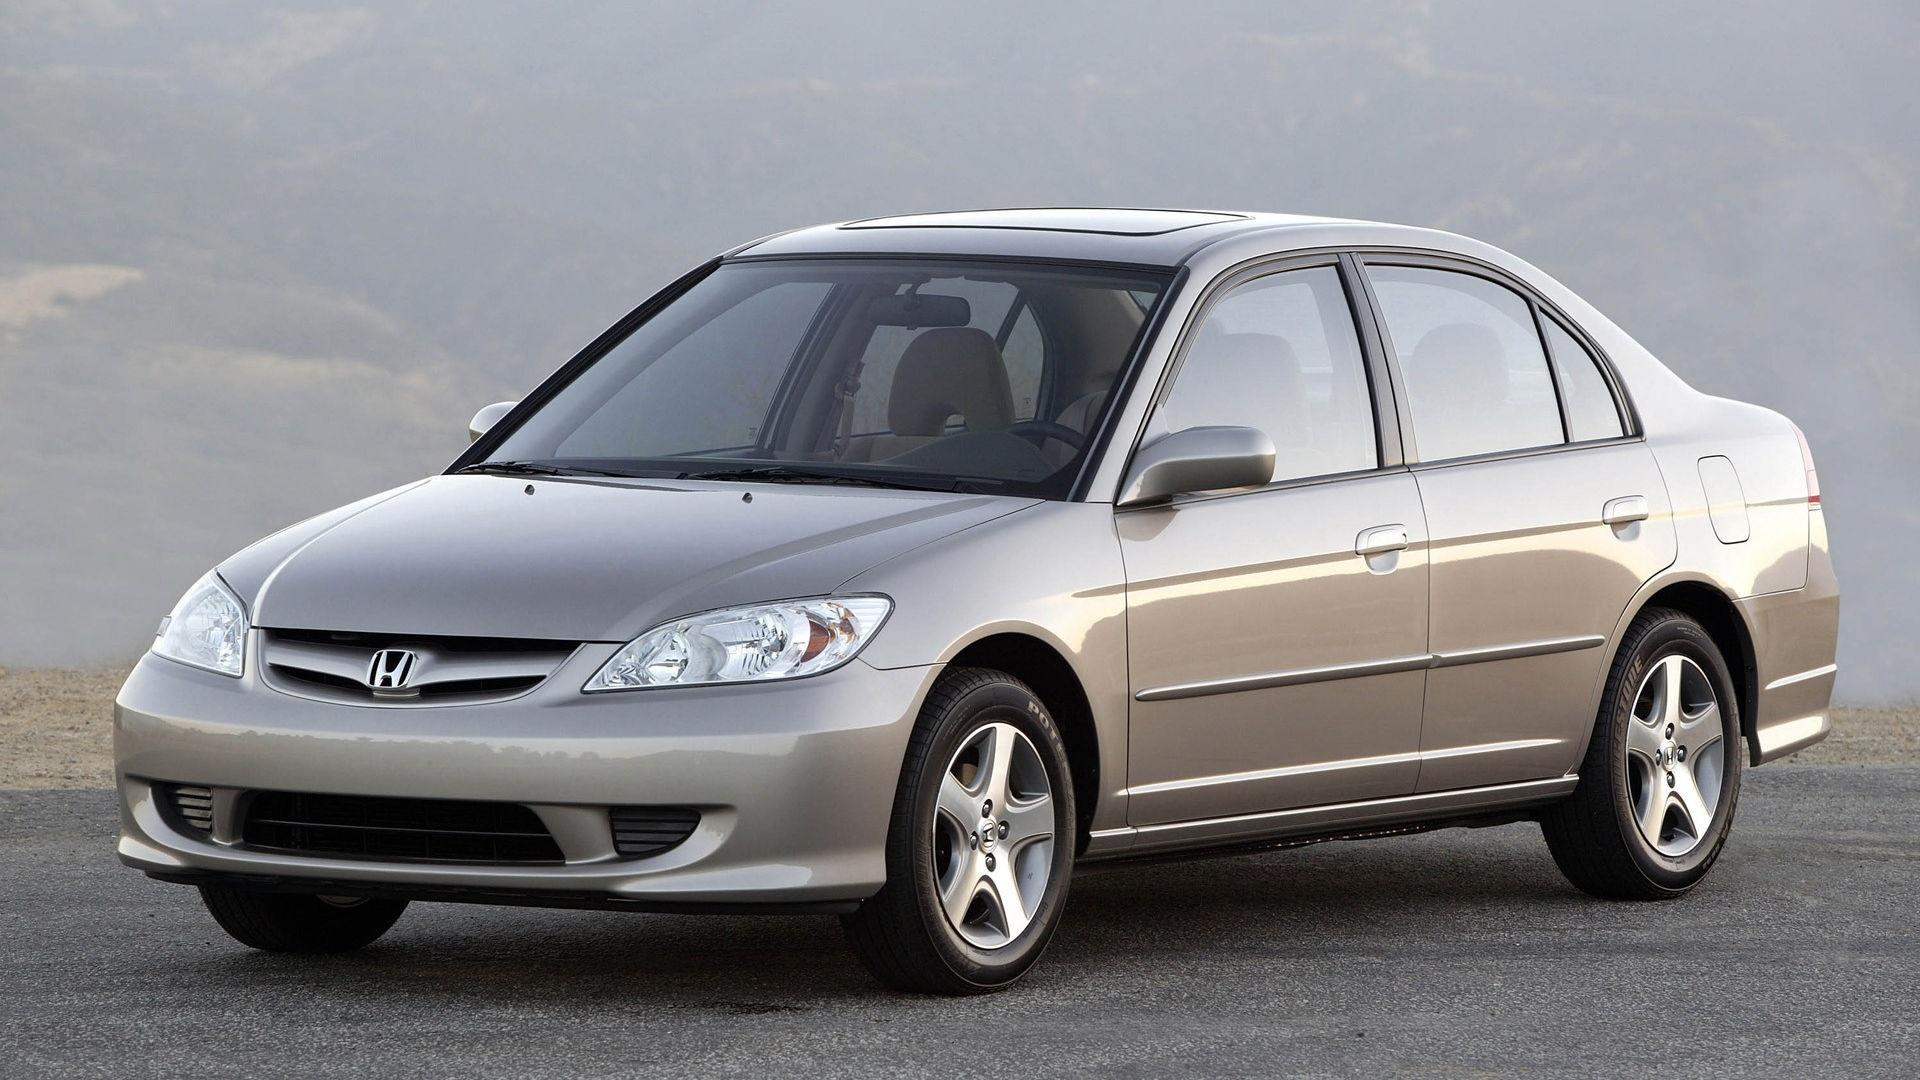 Ball Joint Honda Civic 2004 Fiam Autoparts